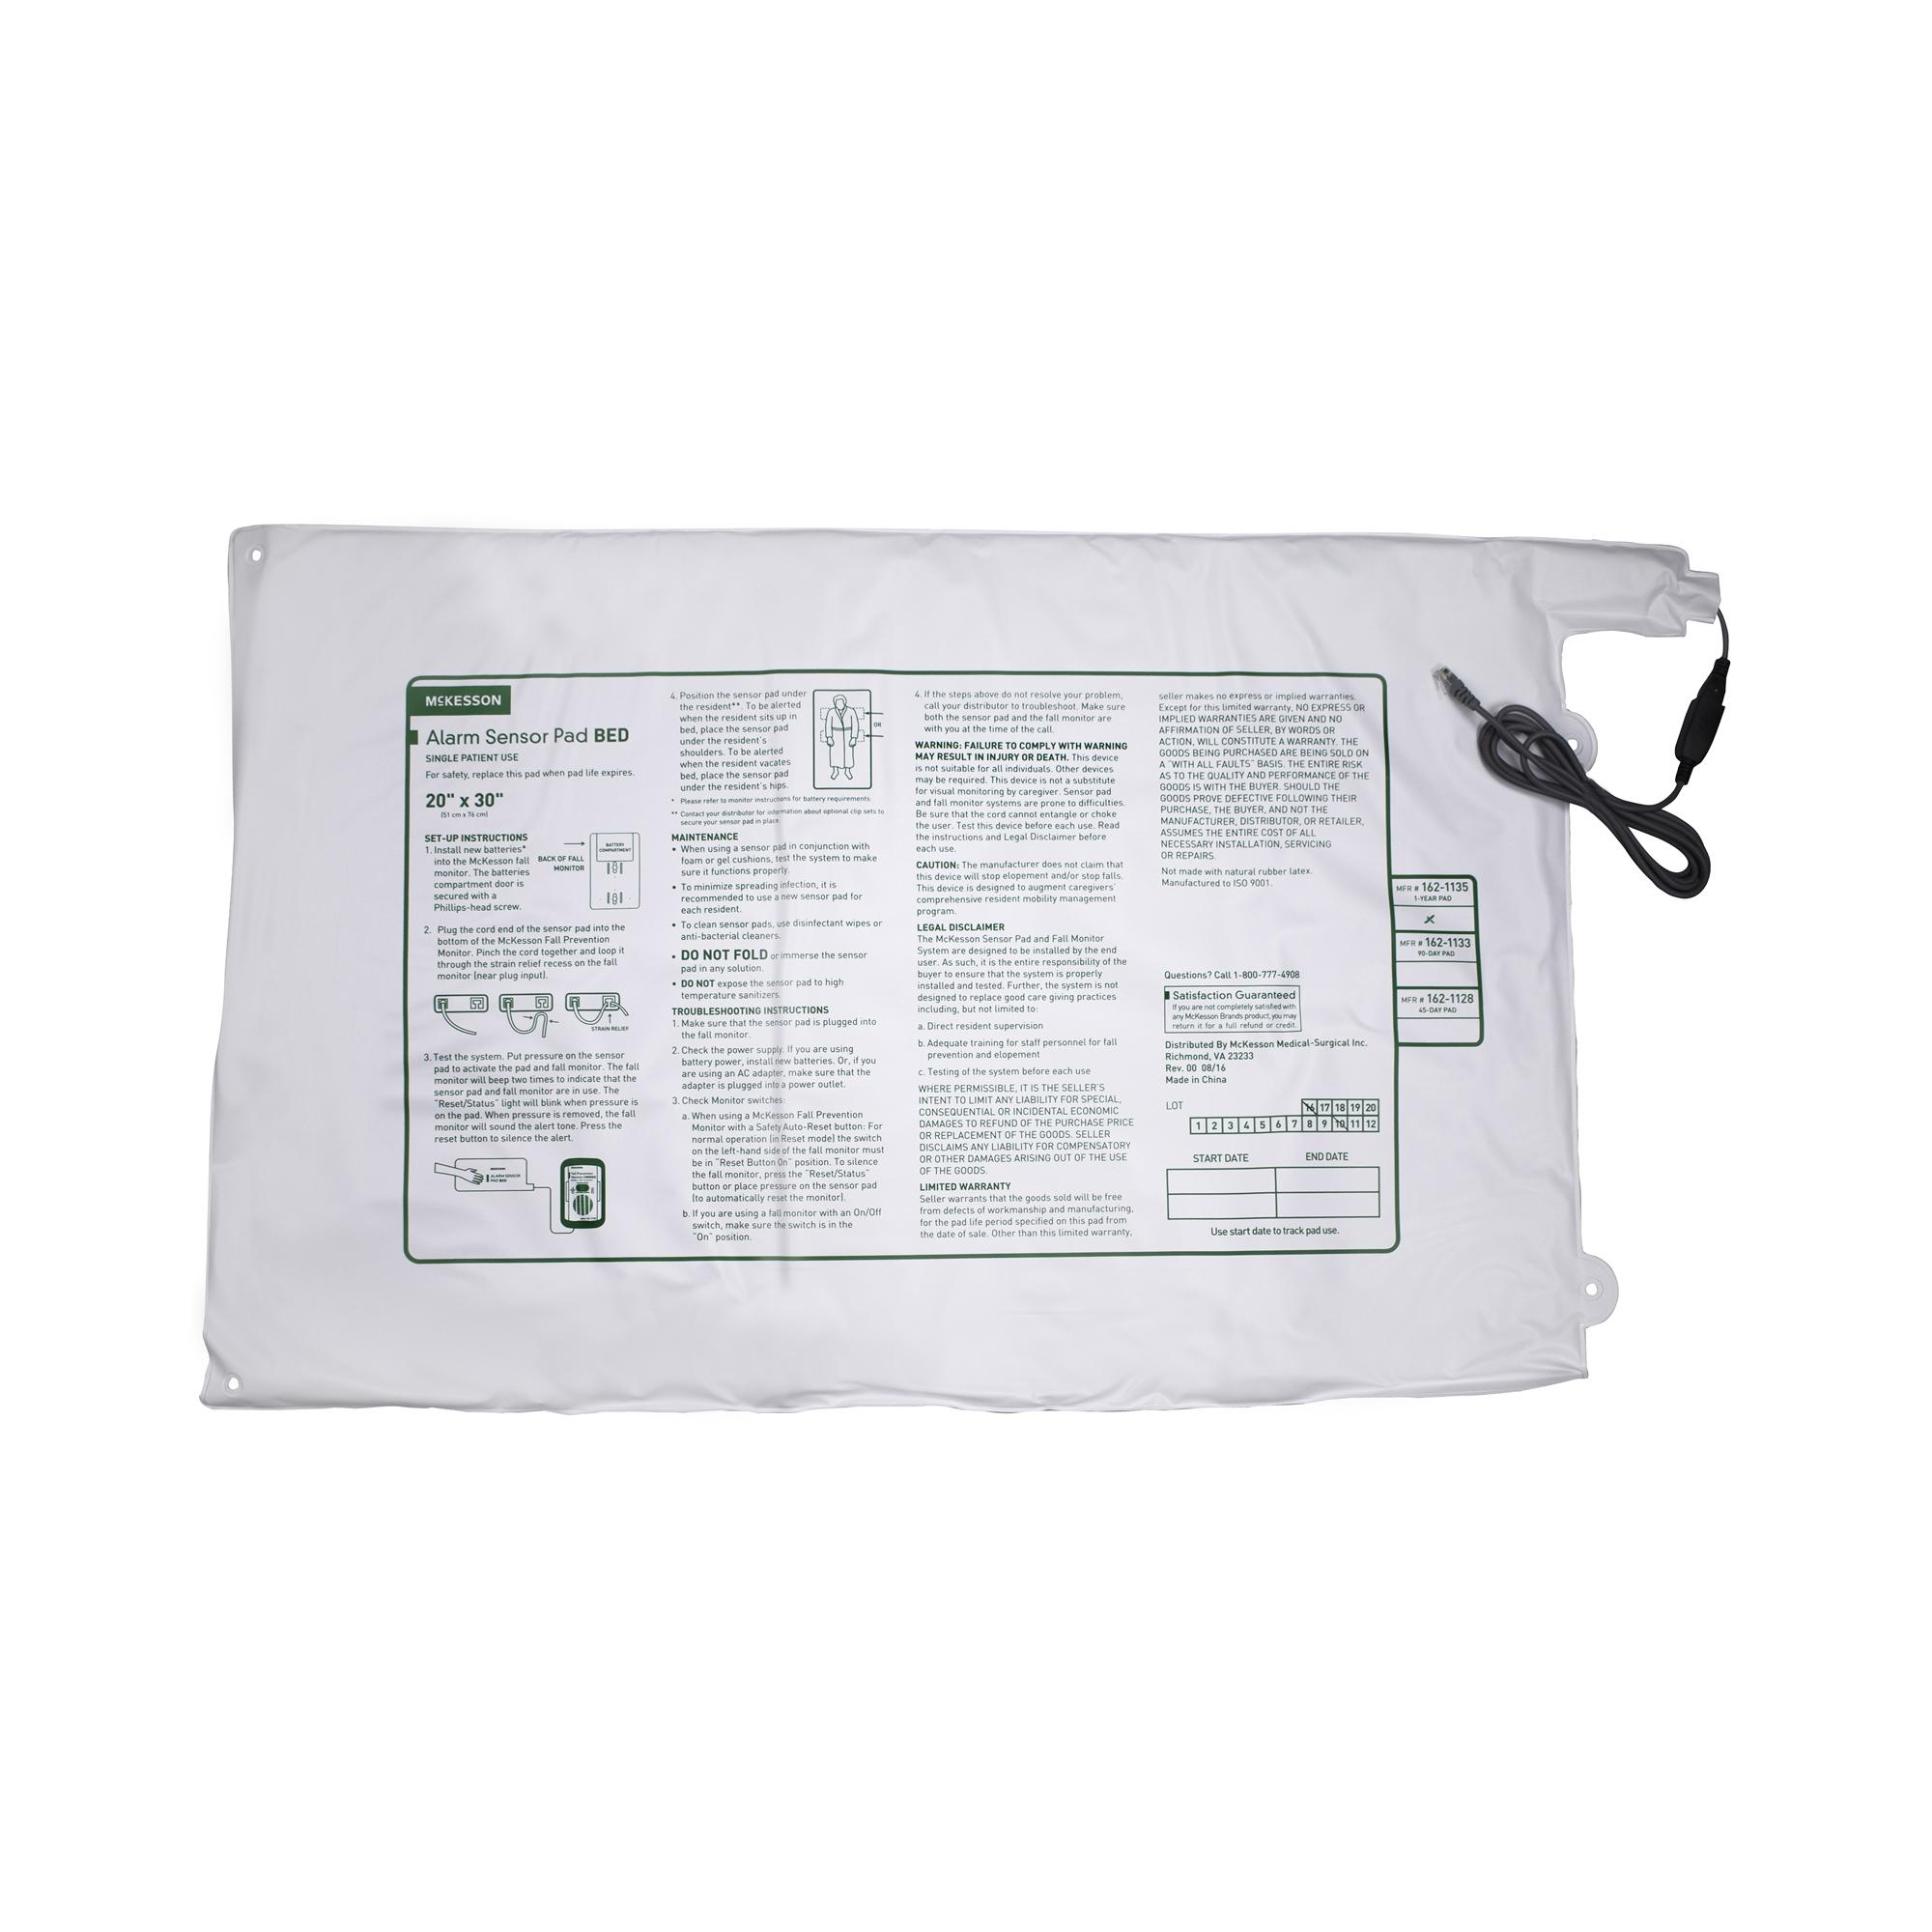 "McKesson Alarm Sensor Pad, 162-1135, 20 X 30"" - Pad"